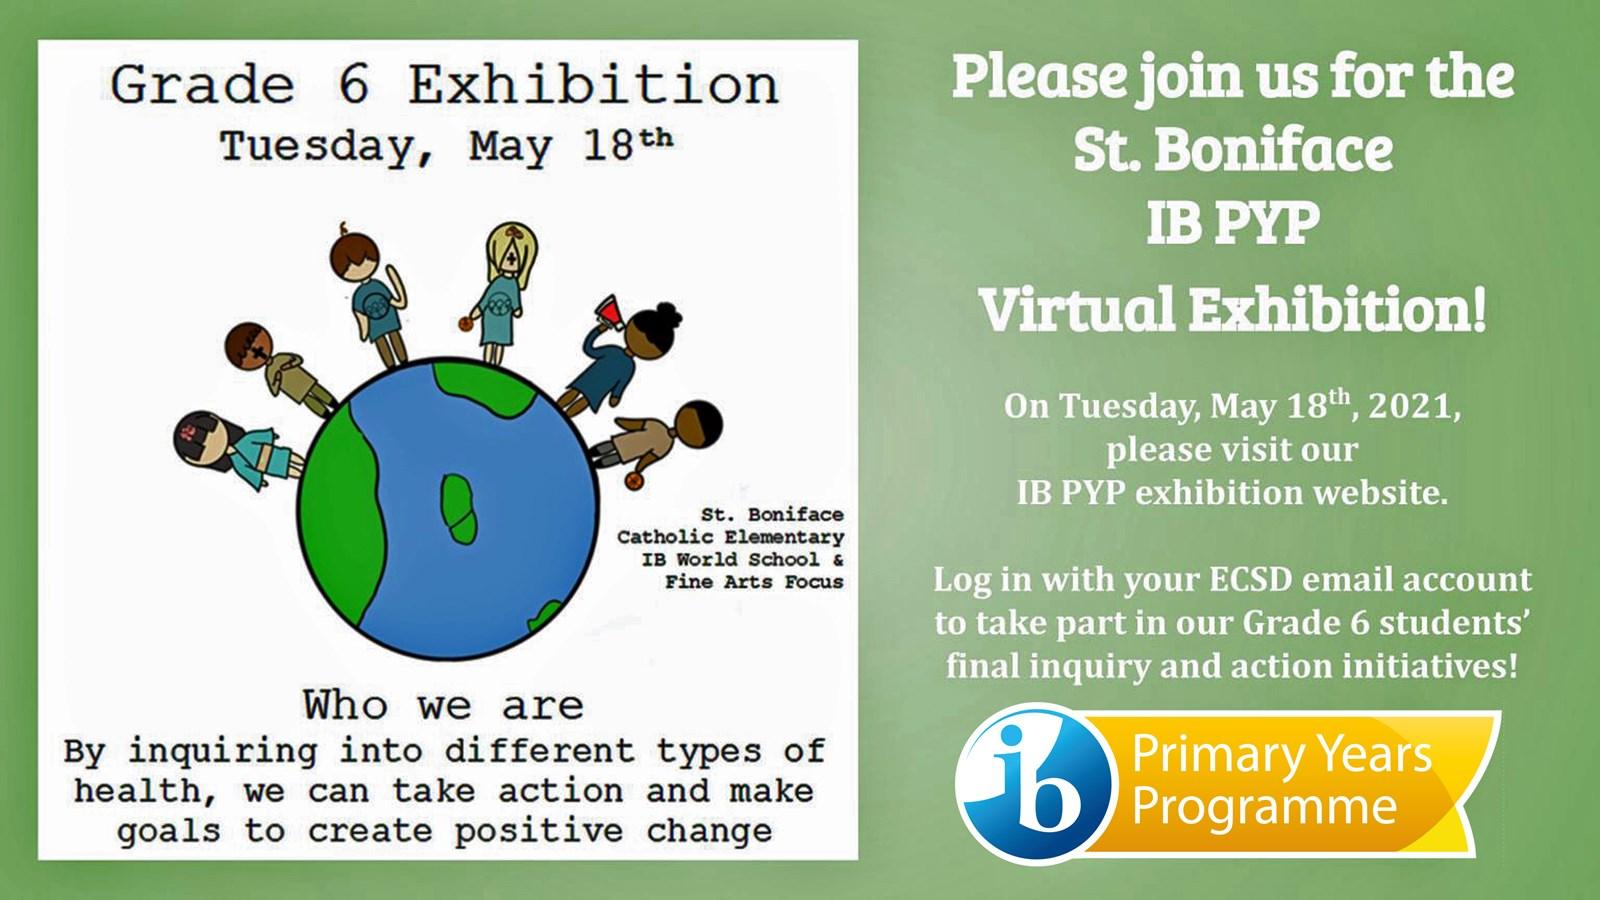 St. Boniface 2021 Exhibition Banner.jpg